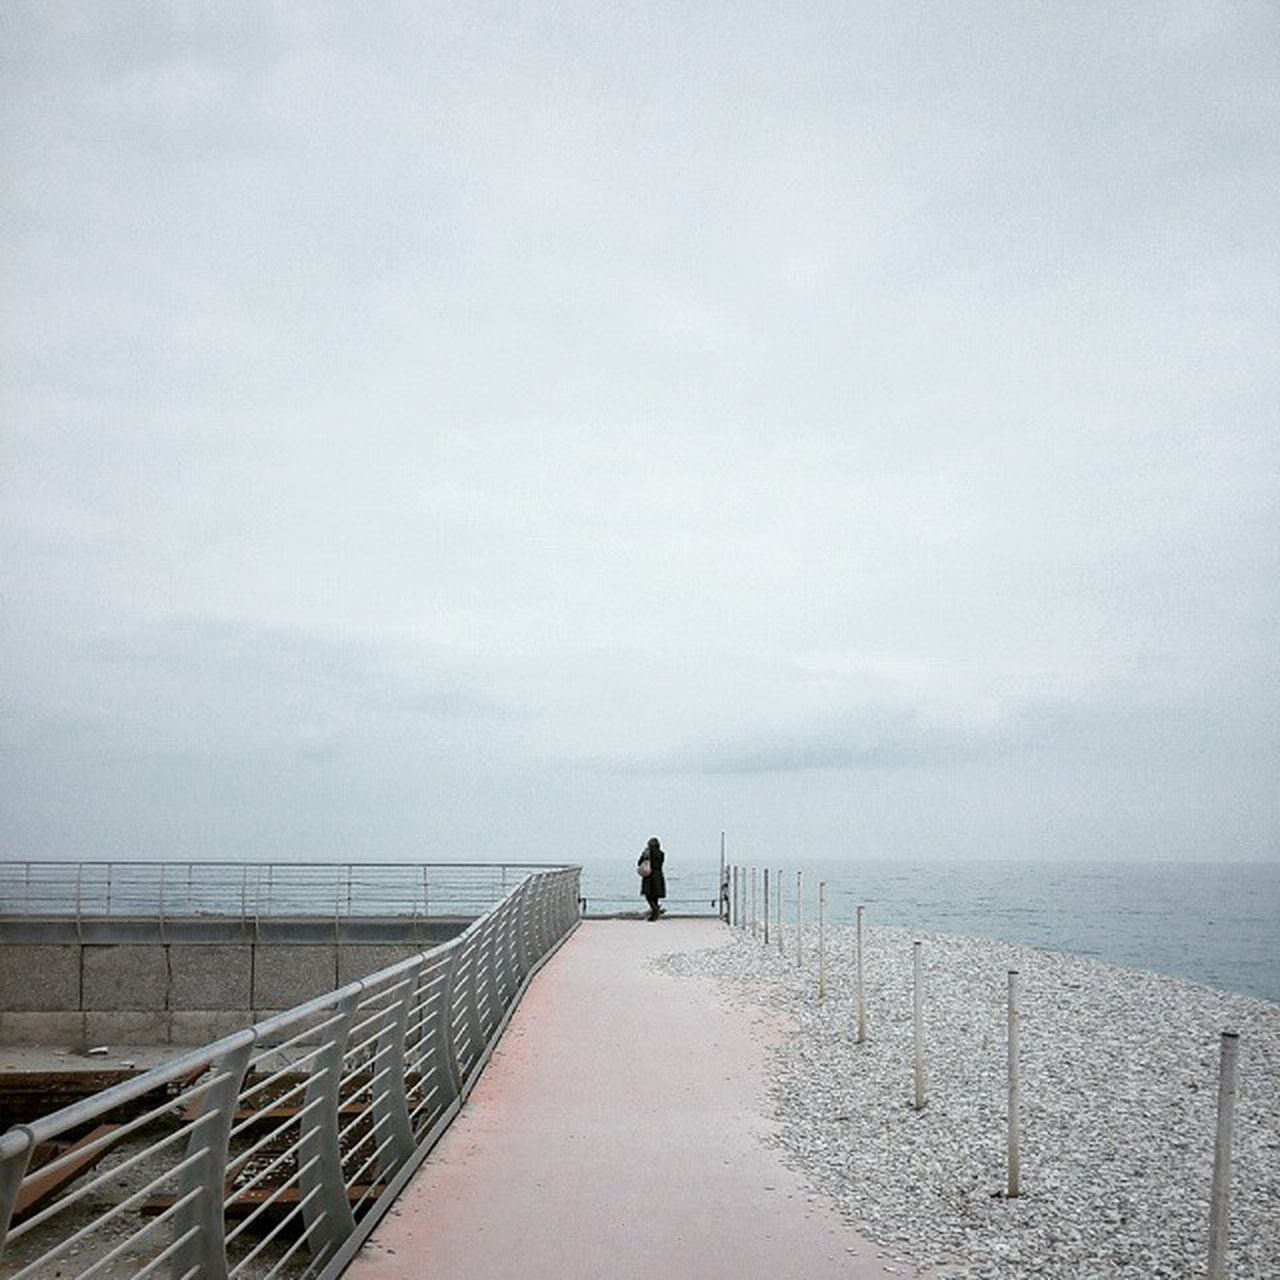 Fano, Italy Fano Landscape Sea Urban City People Instapics Instagrammer Iphonesia Iphoneonly Urban Landscape Beach